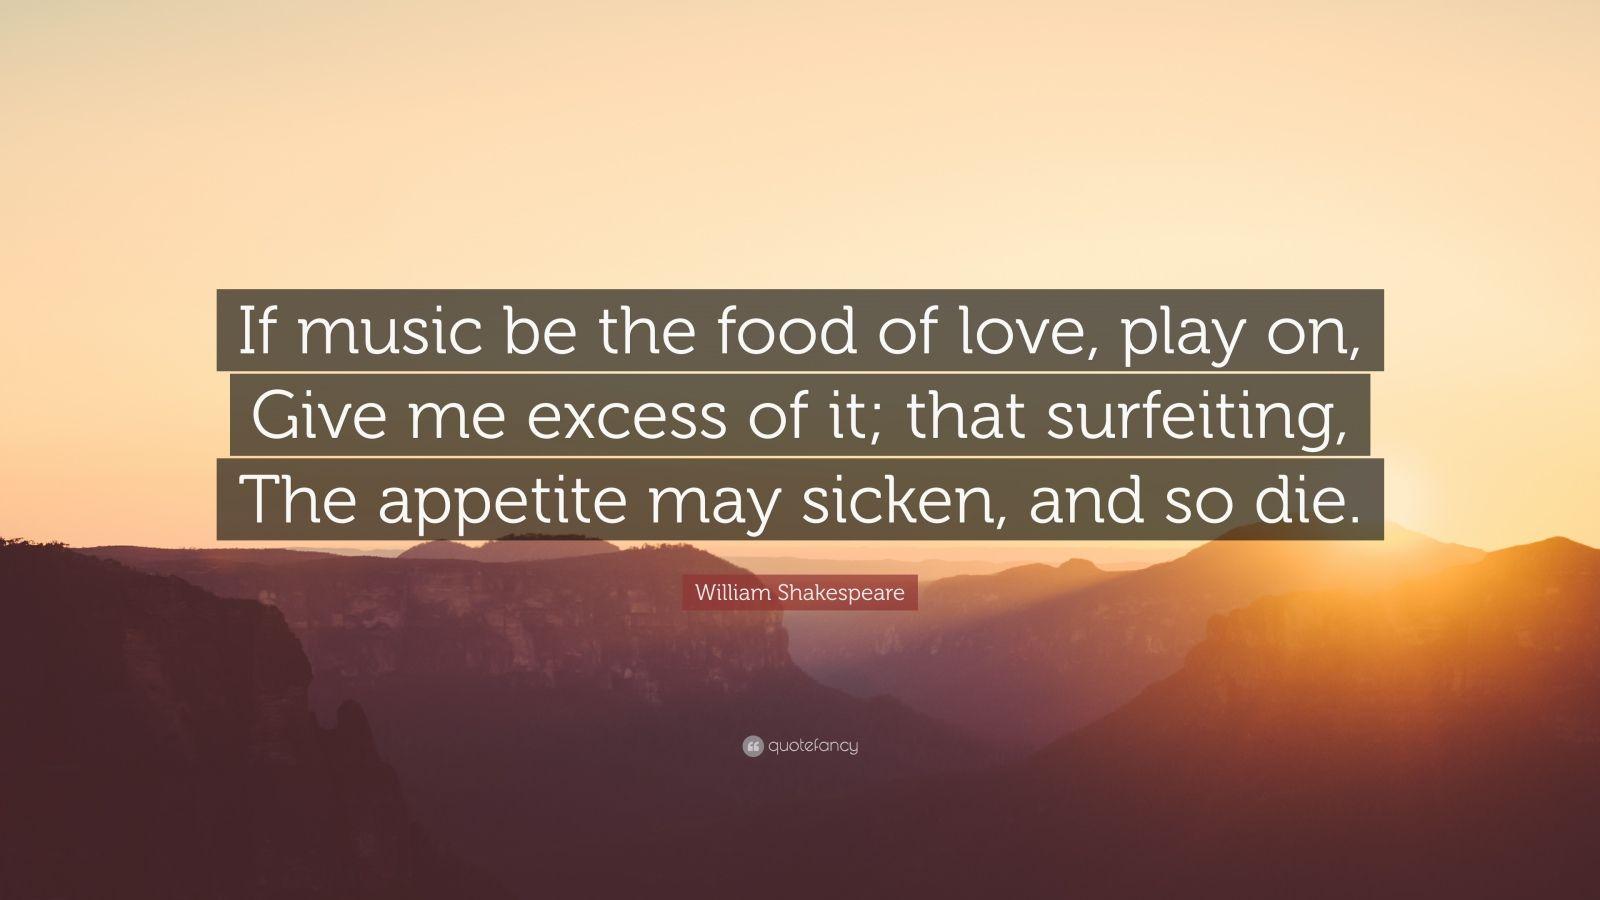 Shakespeare Quotes About Love Amusing William Shakespeare Quotes 100 Wallpapers  Quotefancy